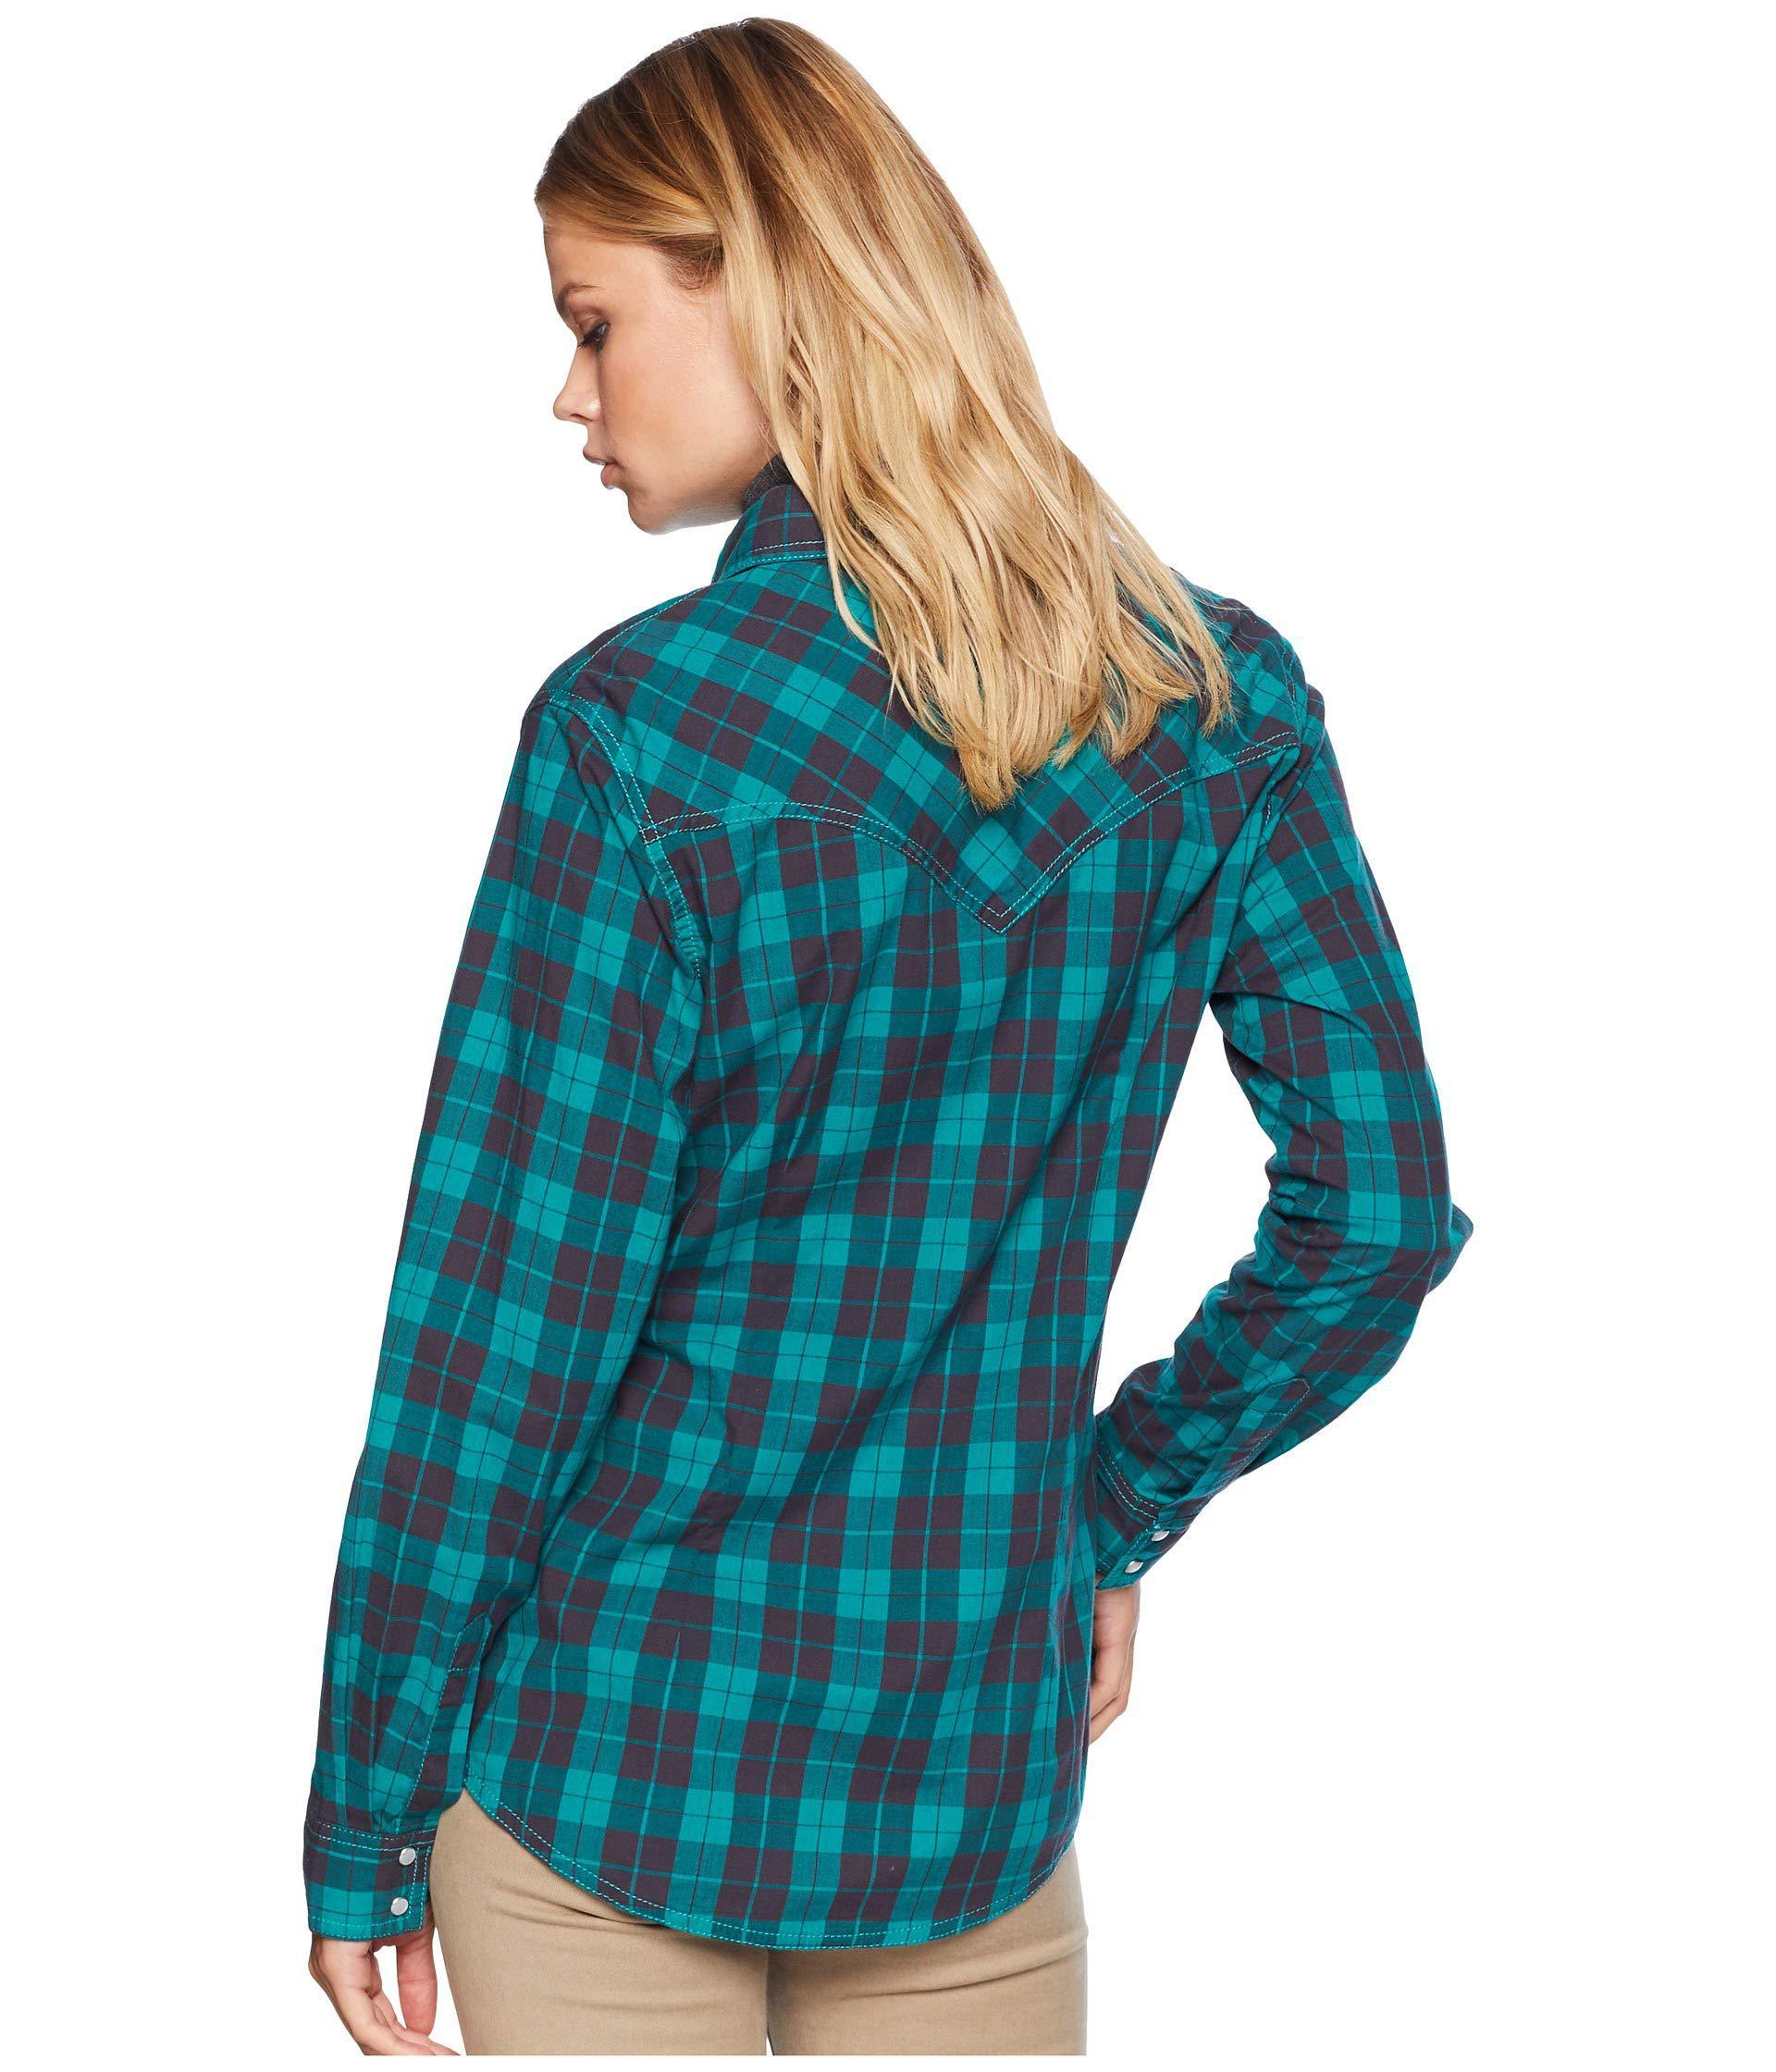 Wrangler Womens Long Sleeve Woven Plaid Snap